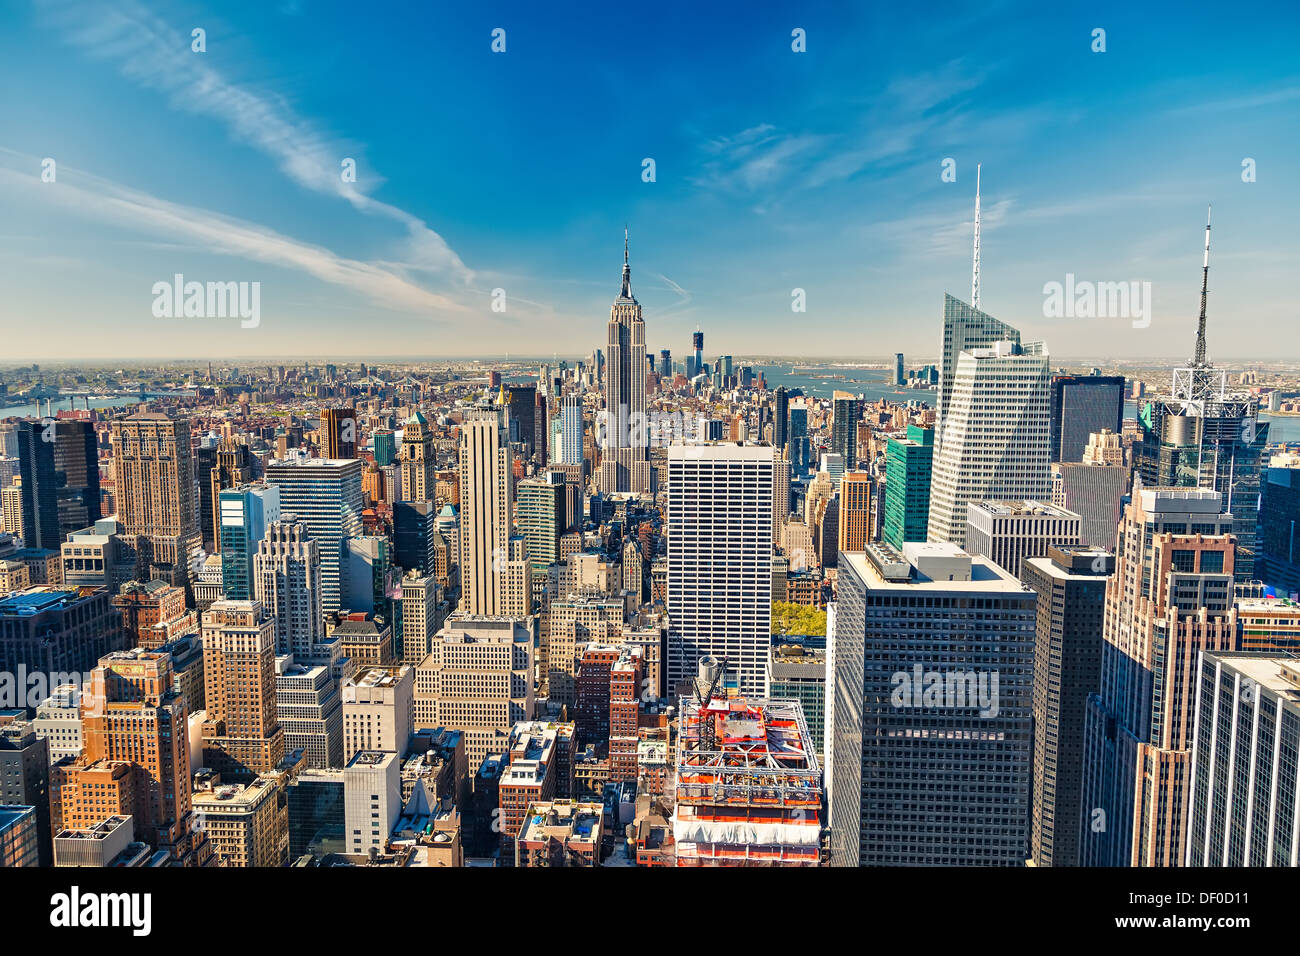 Manhattan Luftbild Stockbild